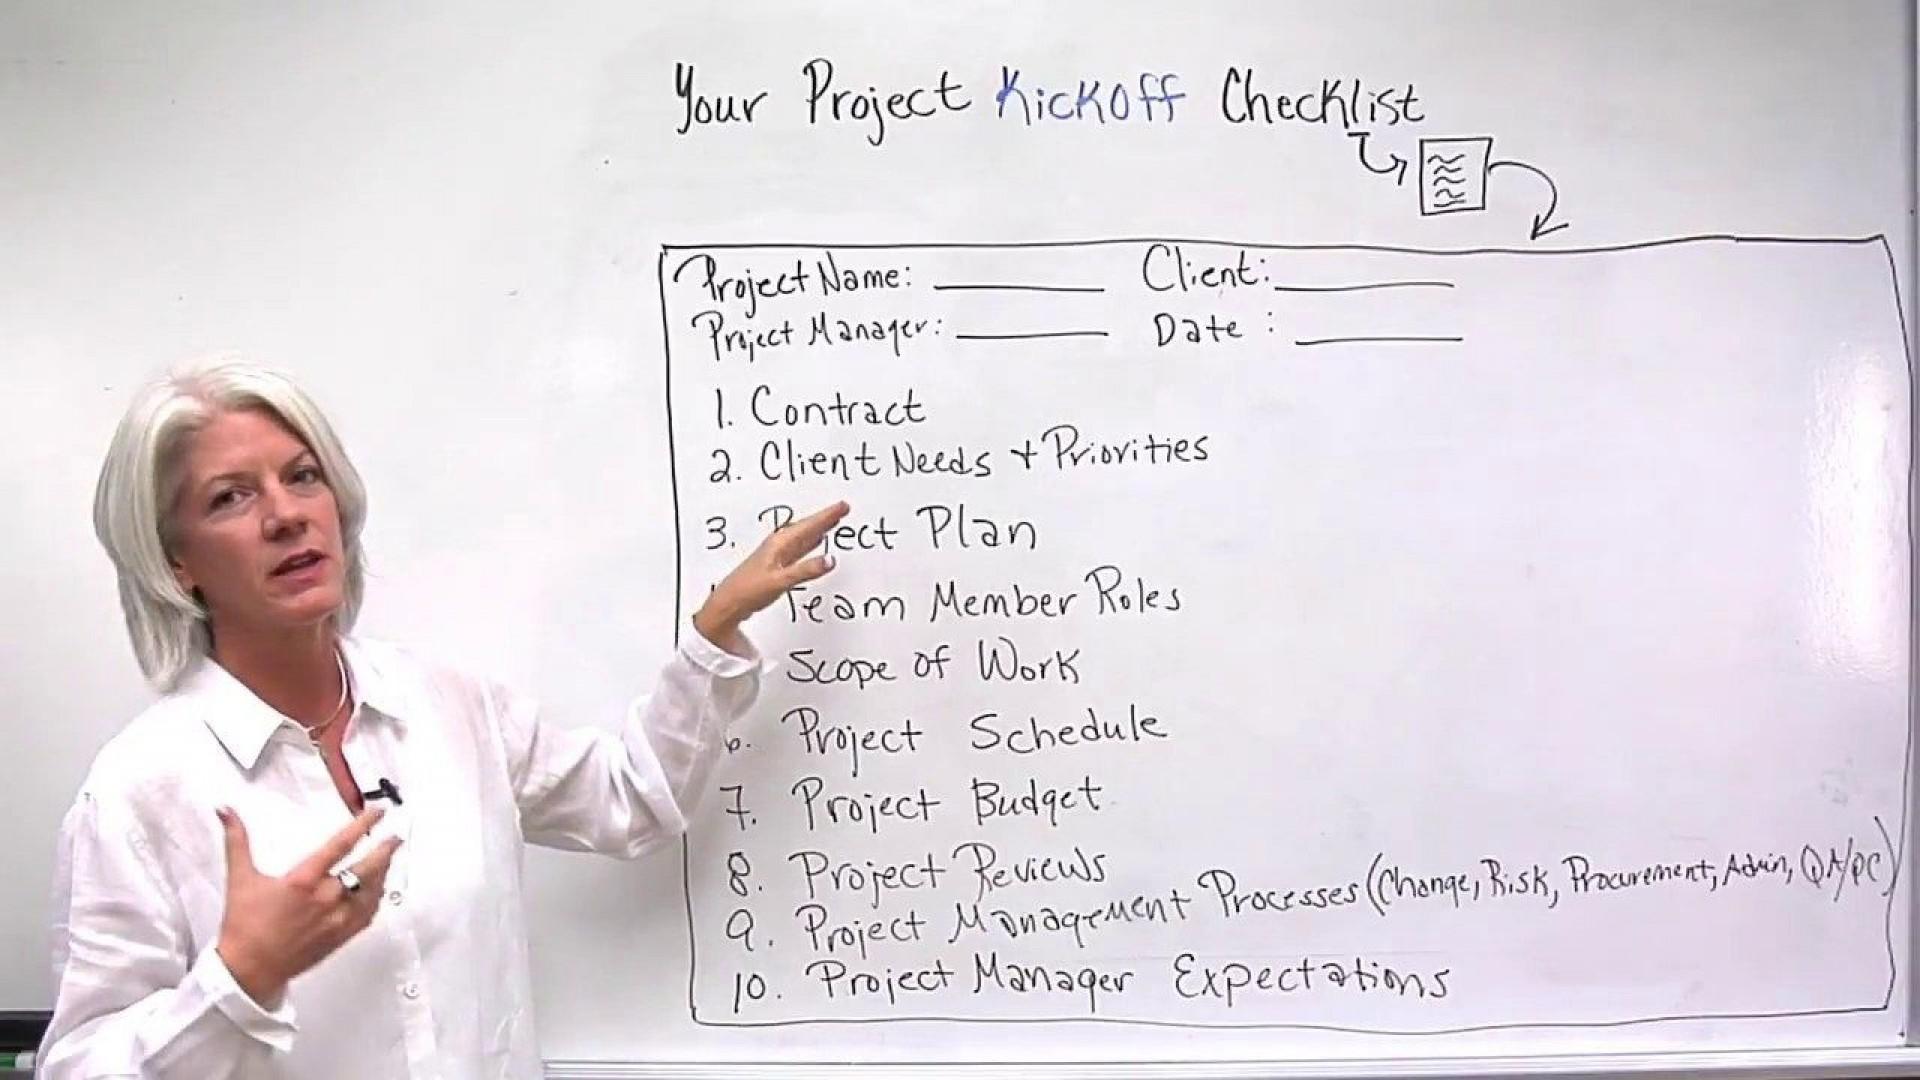 004 Wondrou Project Kickoff Meeting Agenda Template Inspiration  Management1920